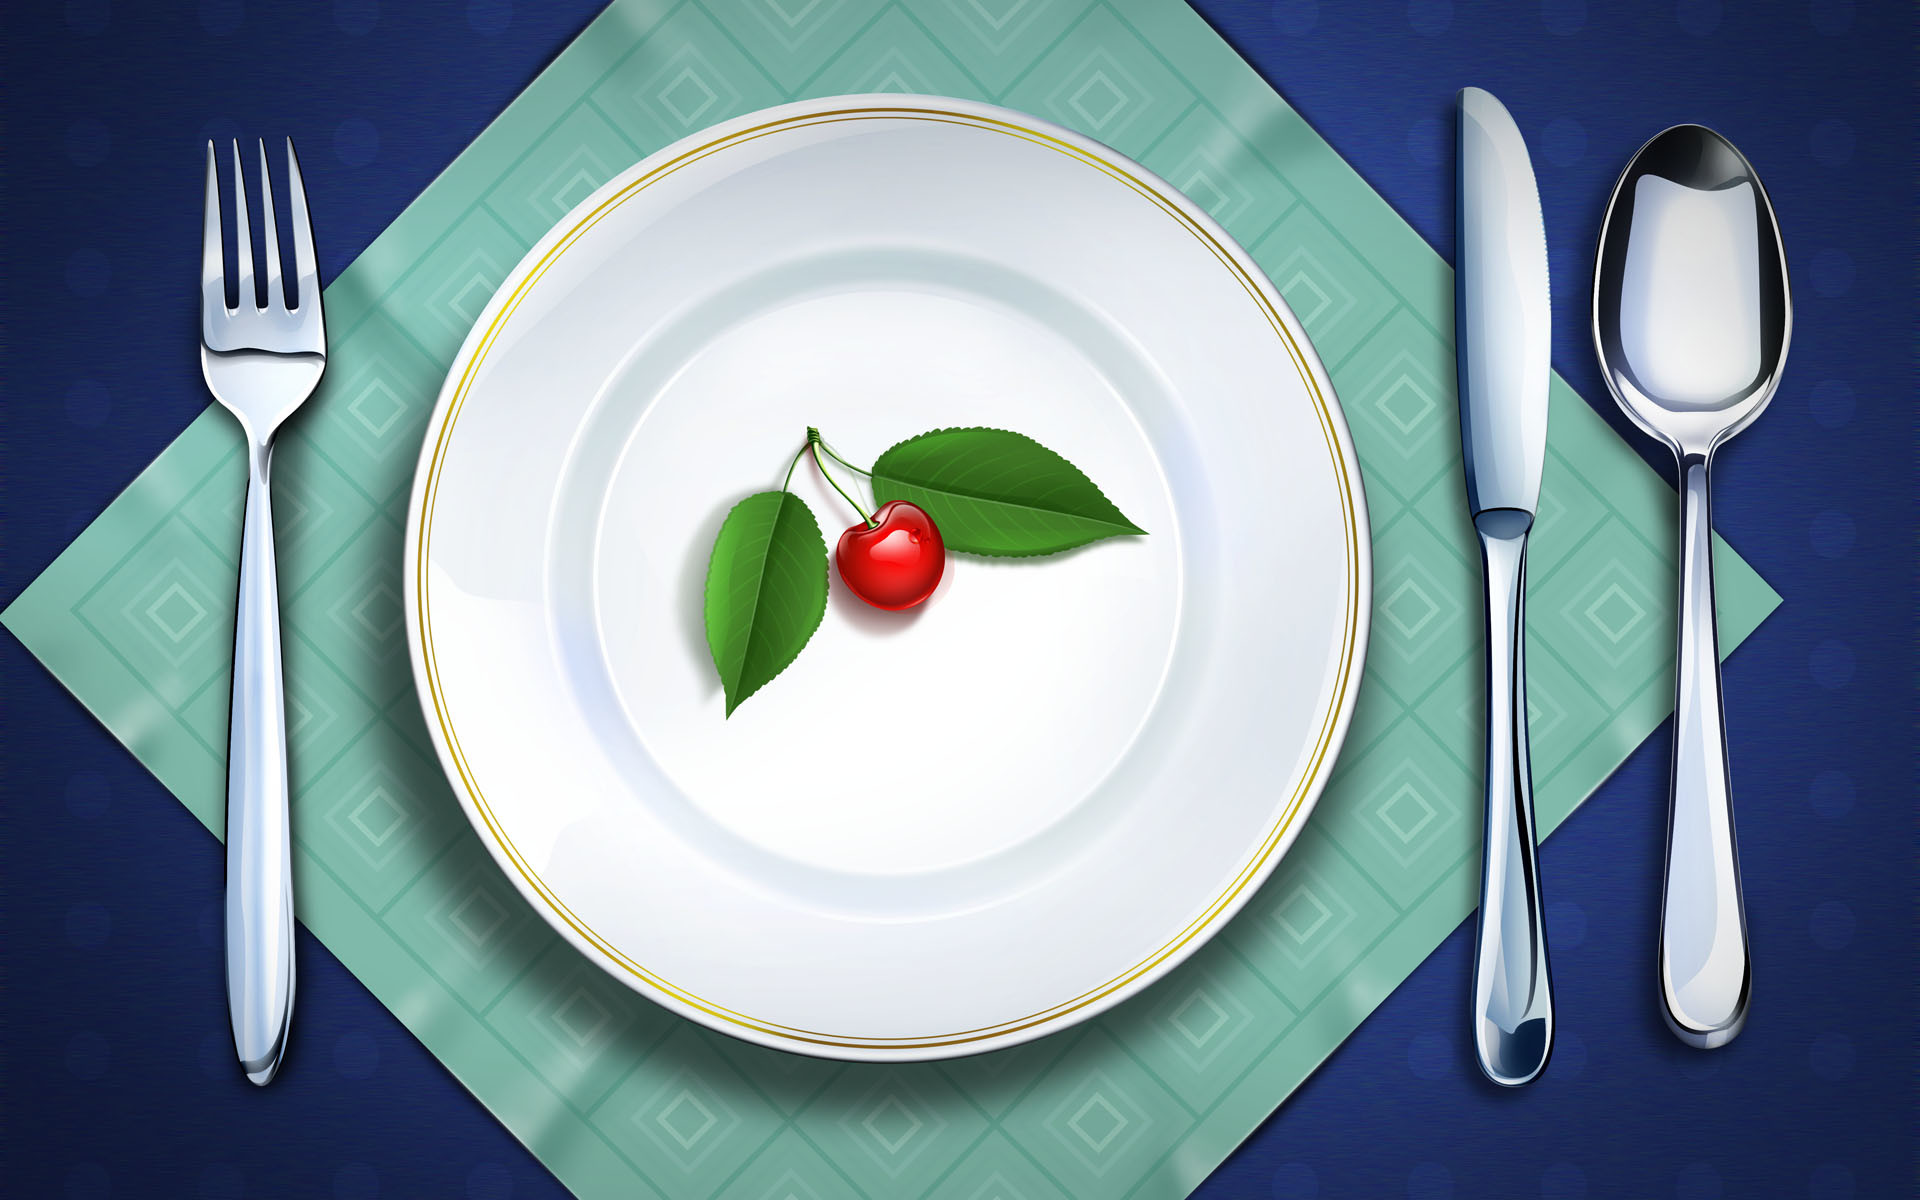 Free 3D Wallpaper Food, food wallpaper hd free – JohnyWheels